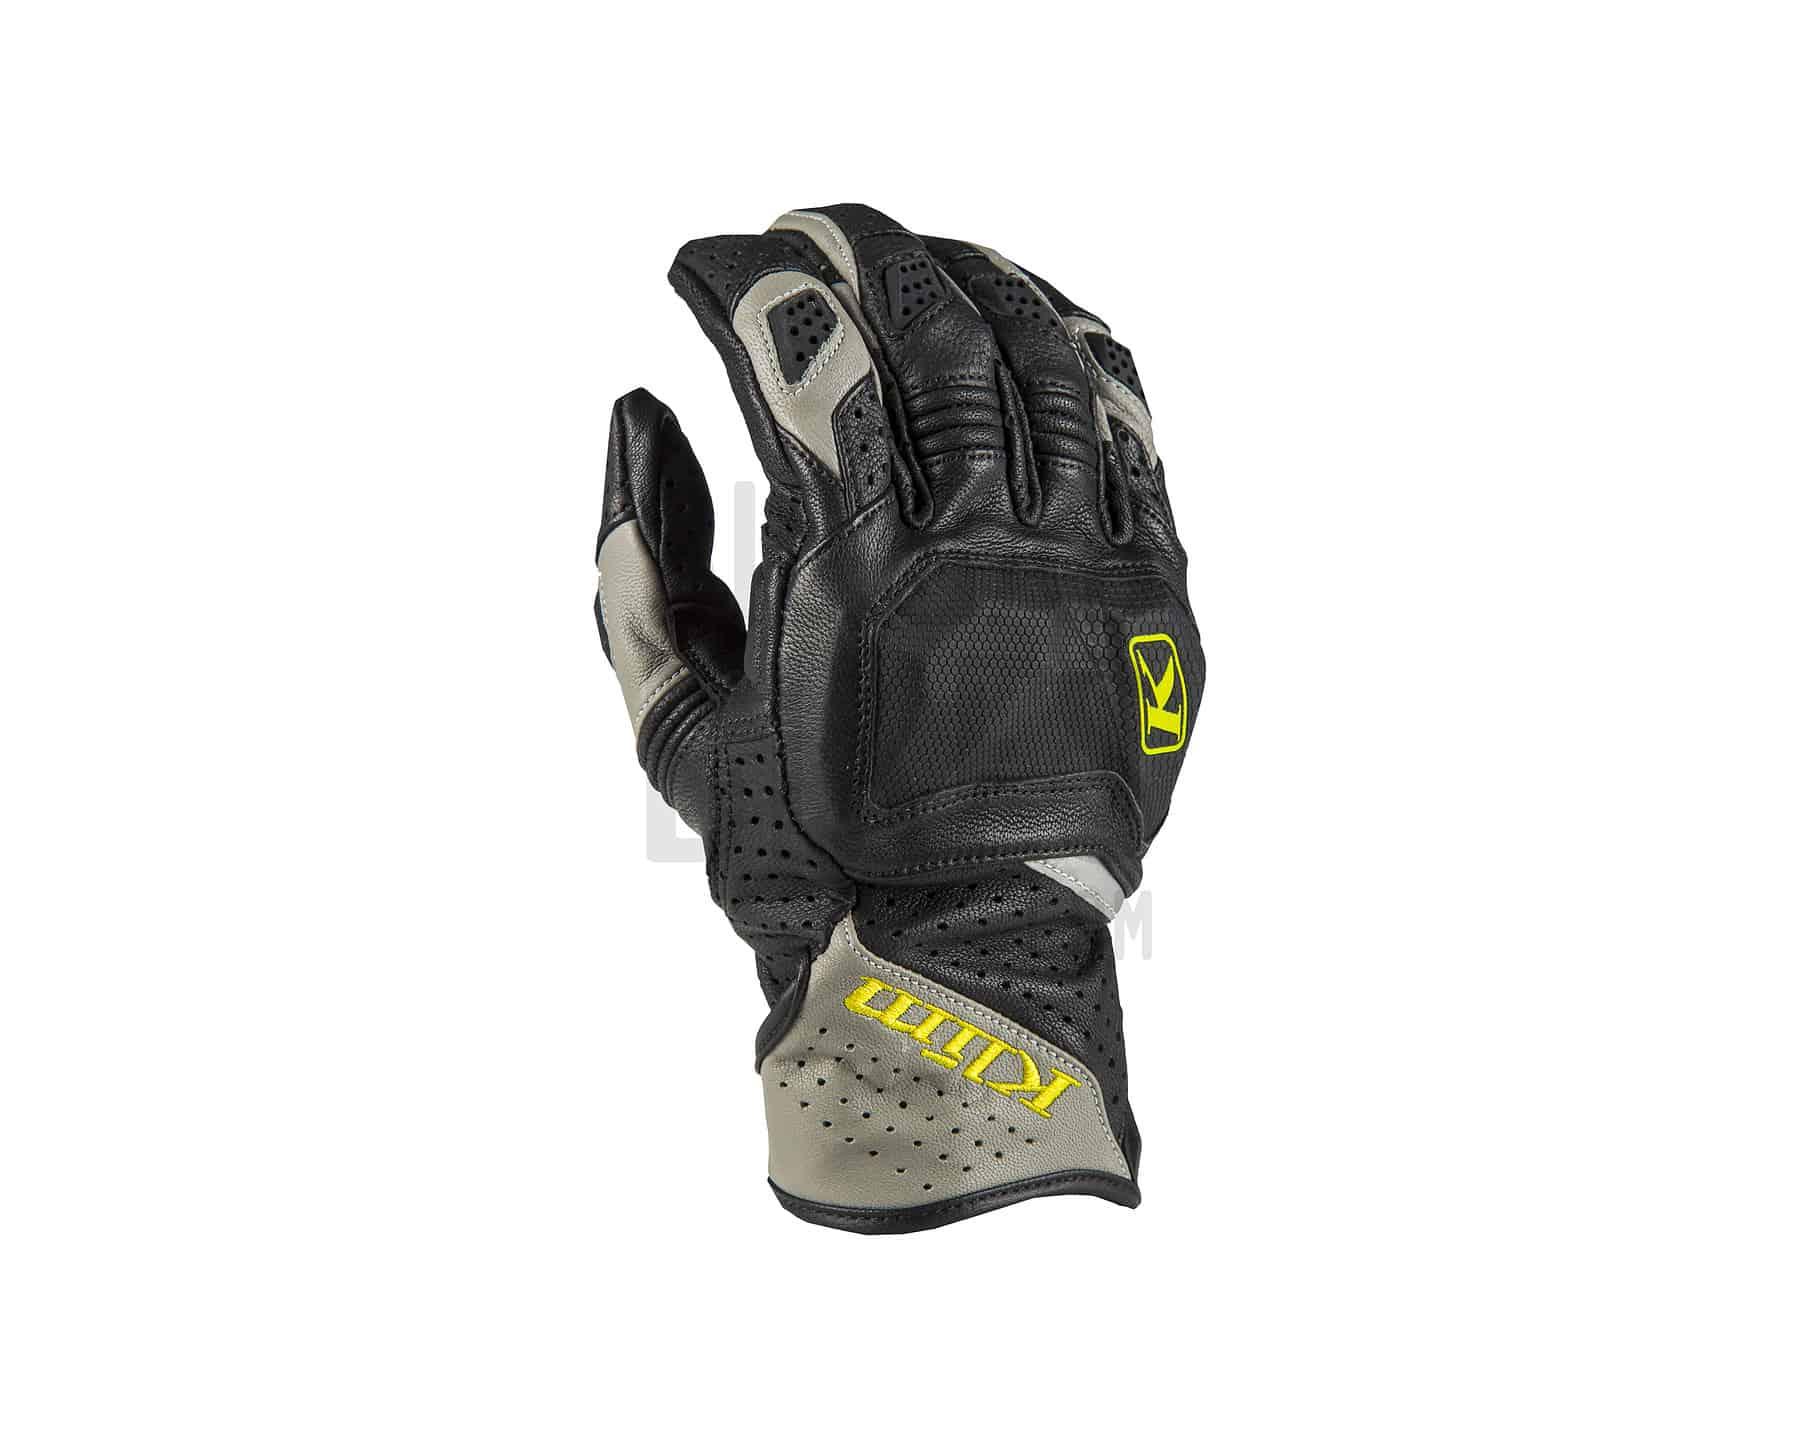 Badlands Aero Pro Short Glove_3924-000_Gray_01